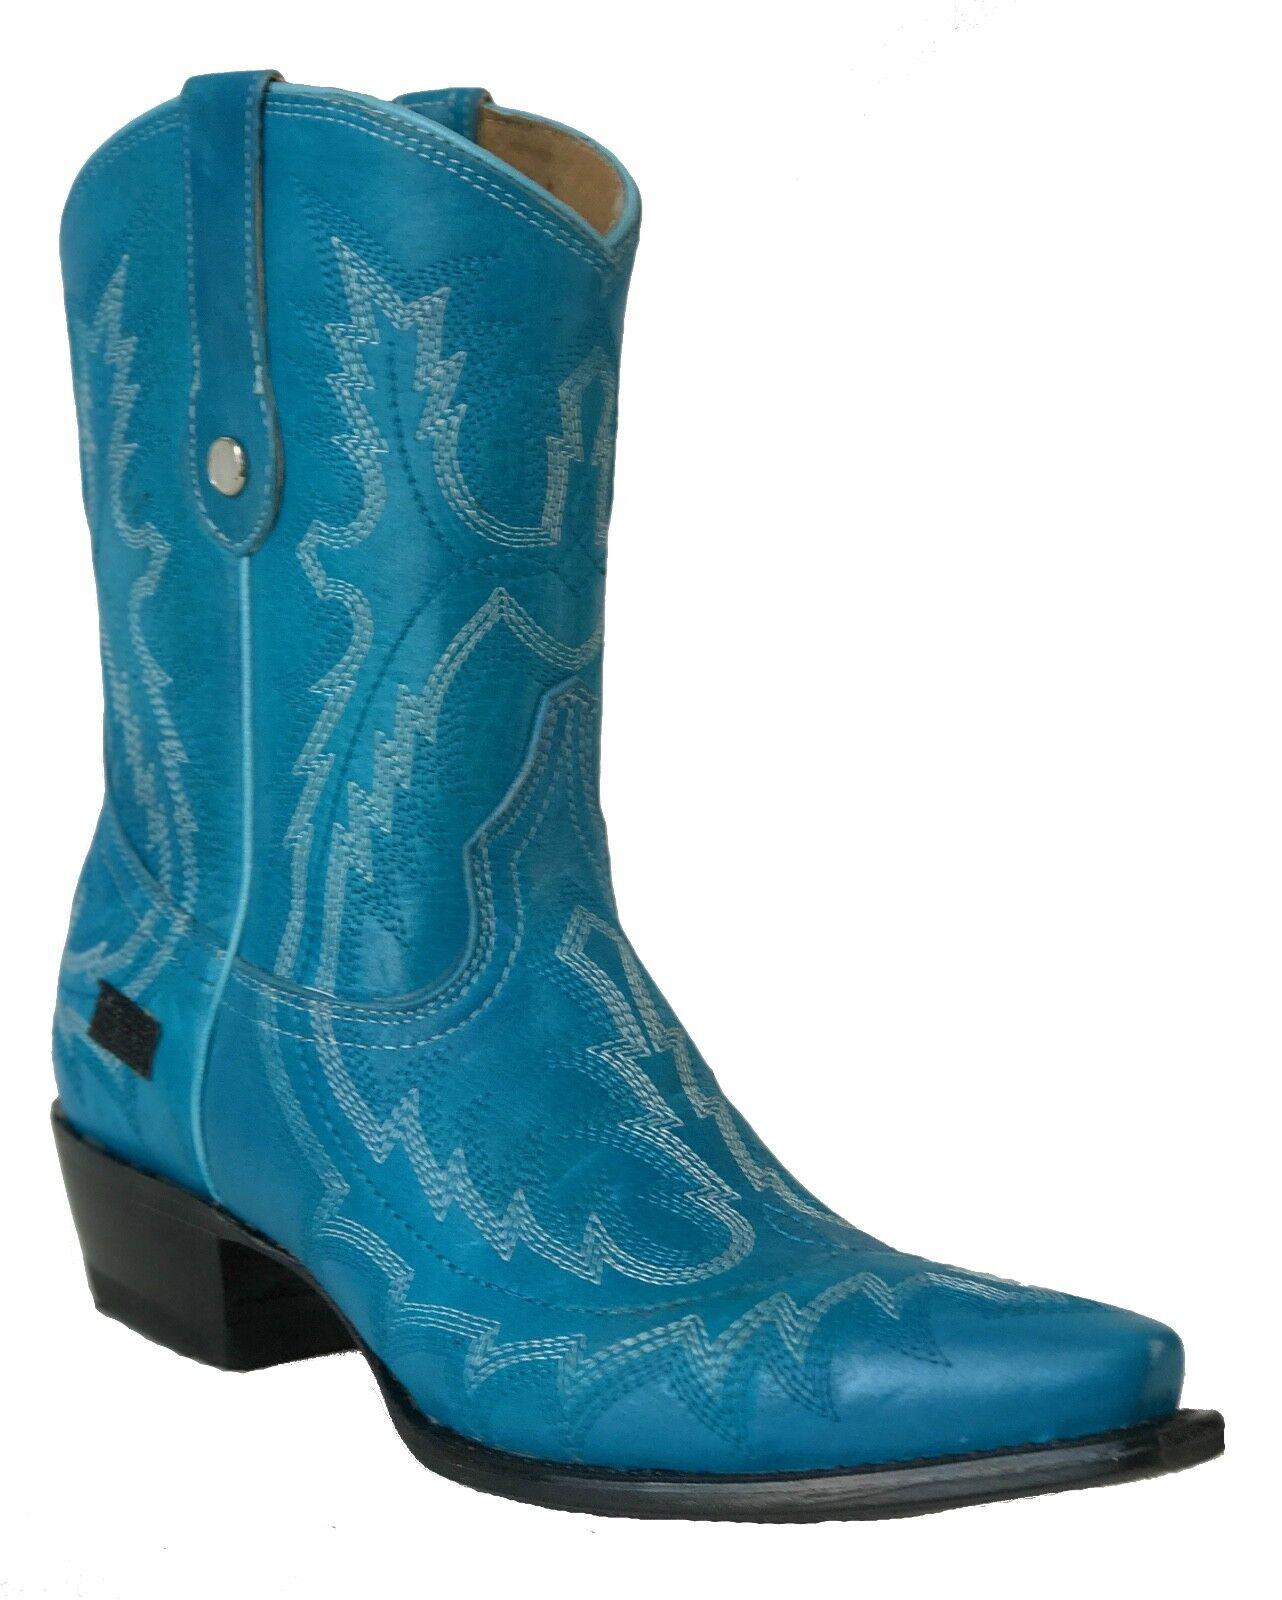 Women's New Leather Cowgirl Western Biker Boots Snip Toe bluee Sale